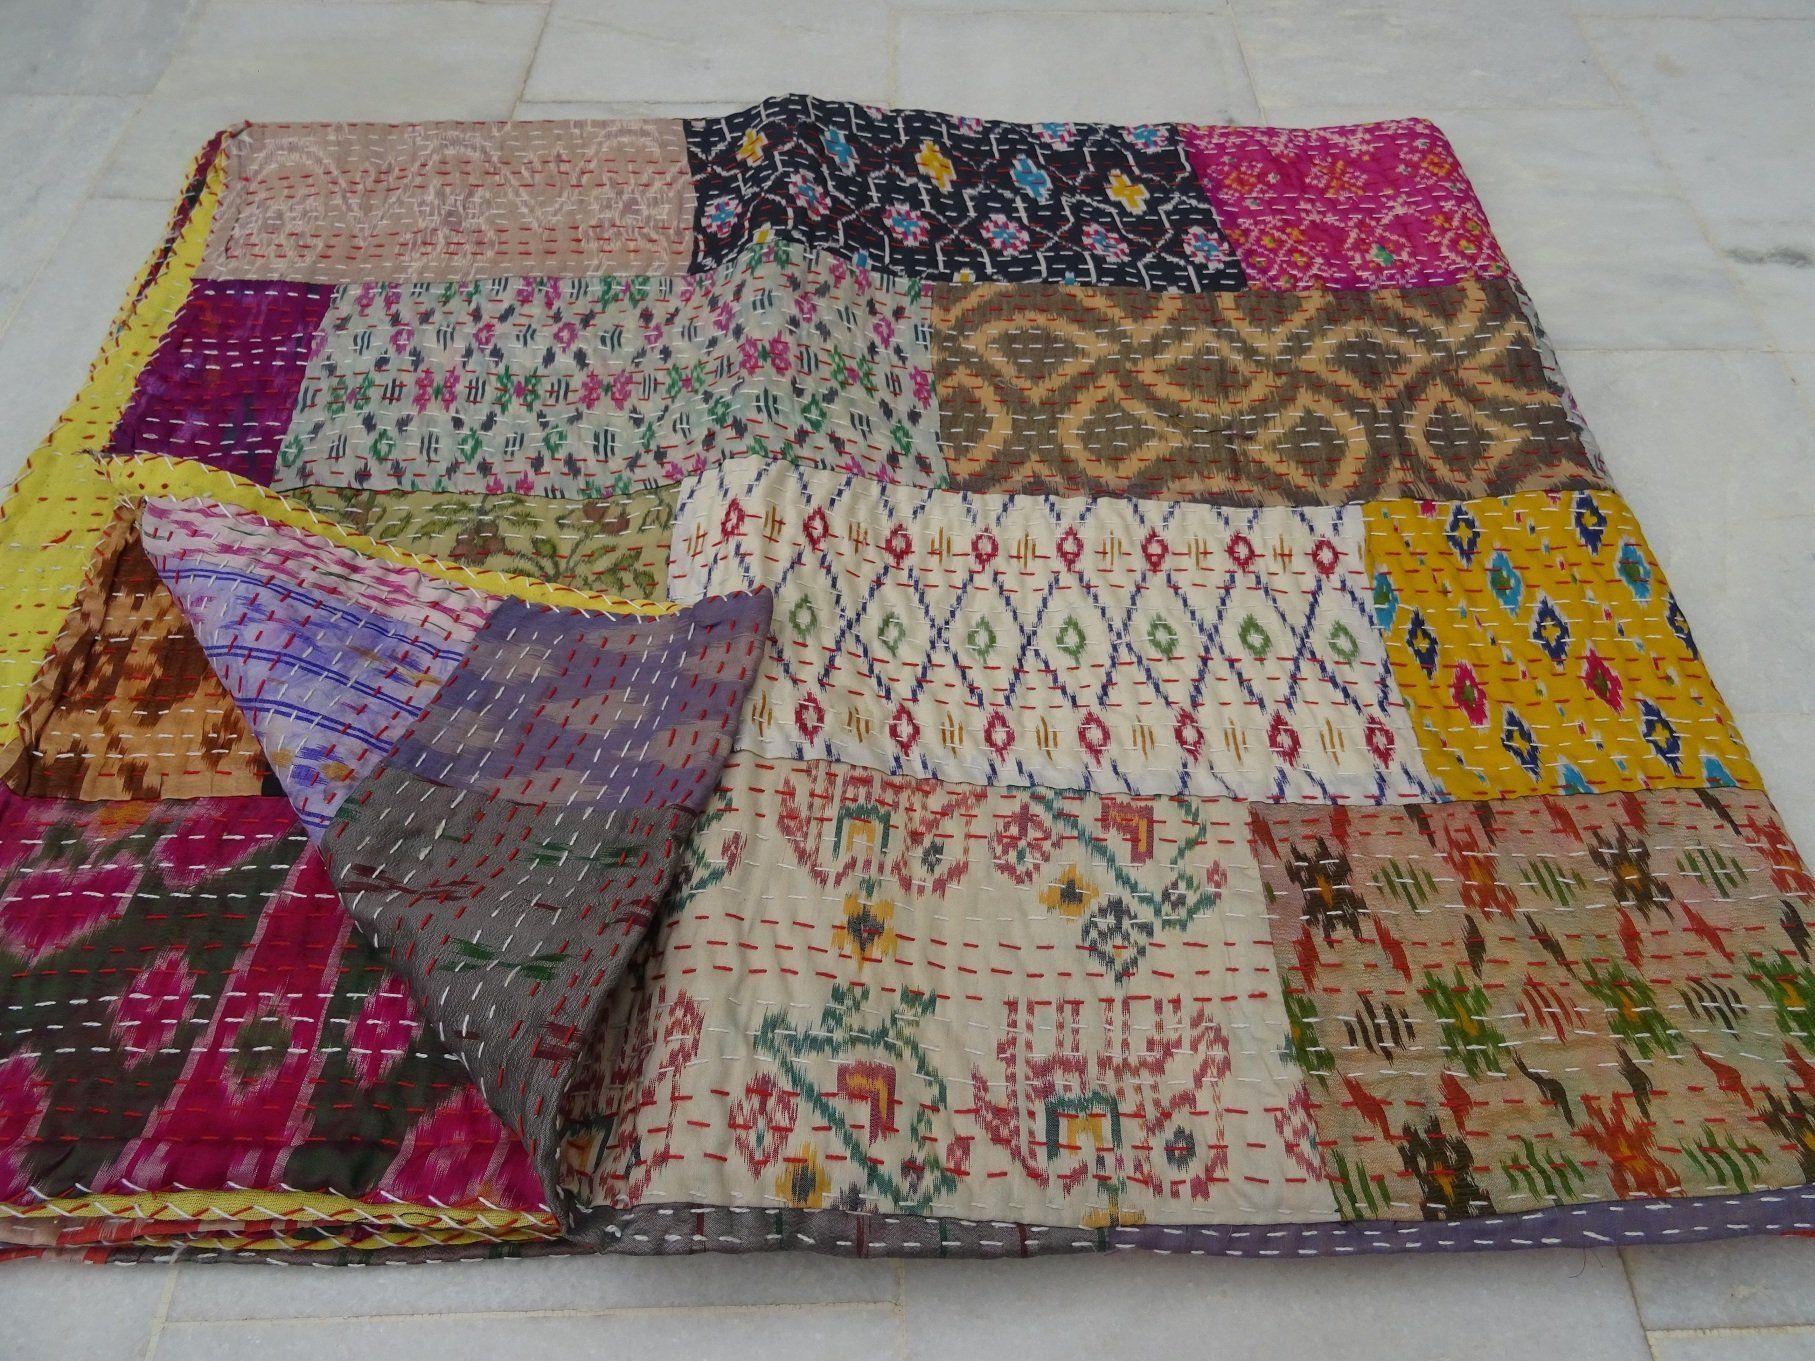 Indian beautiful silk patola kantha king quilt bedspread throw patchwork blanket